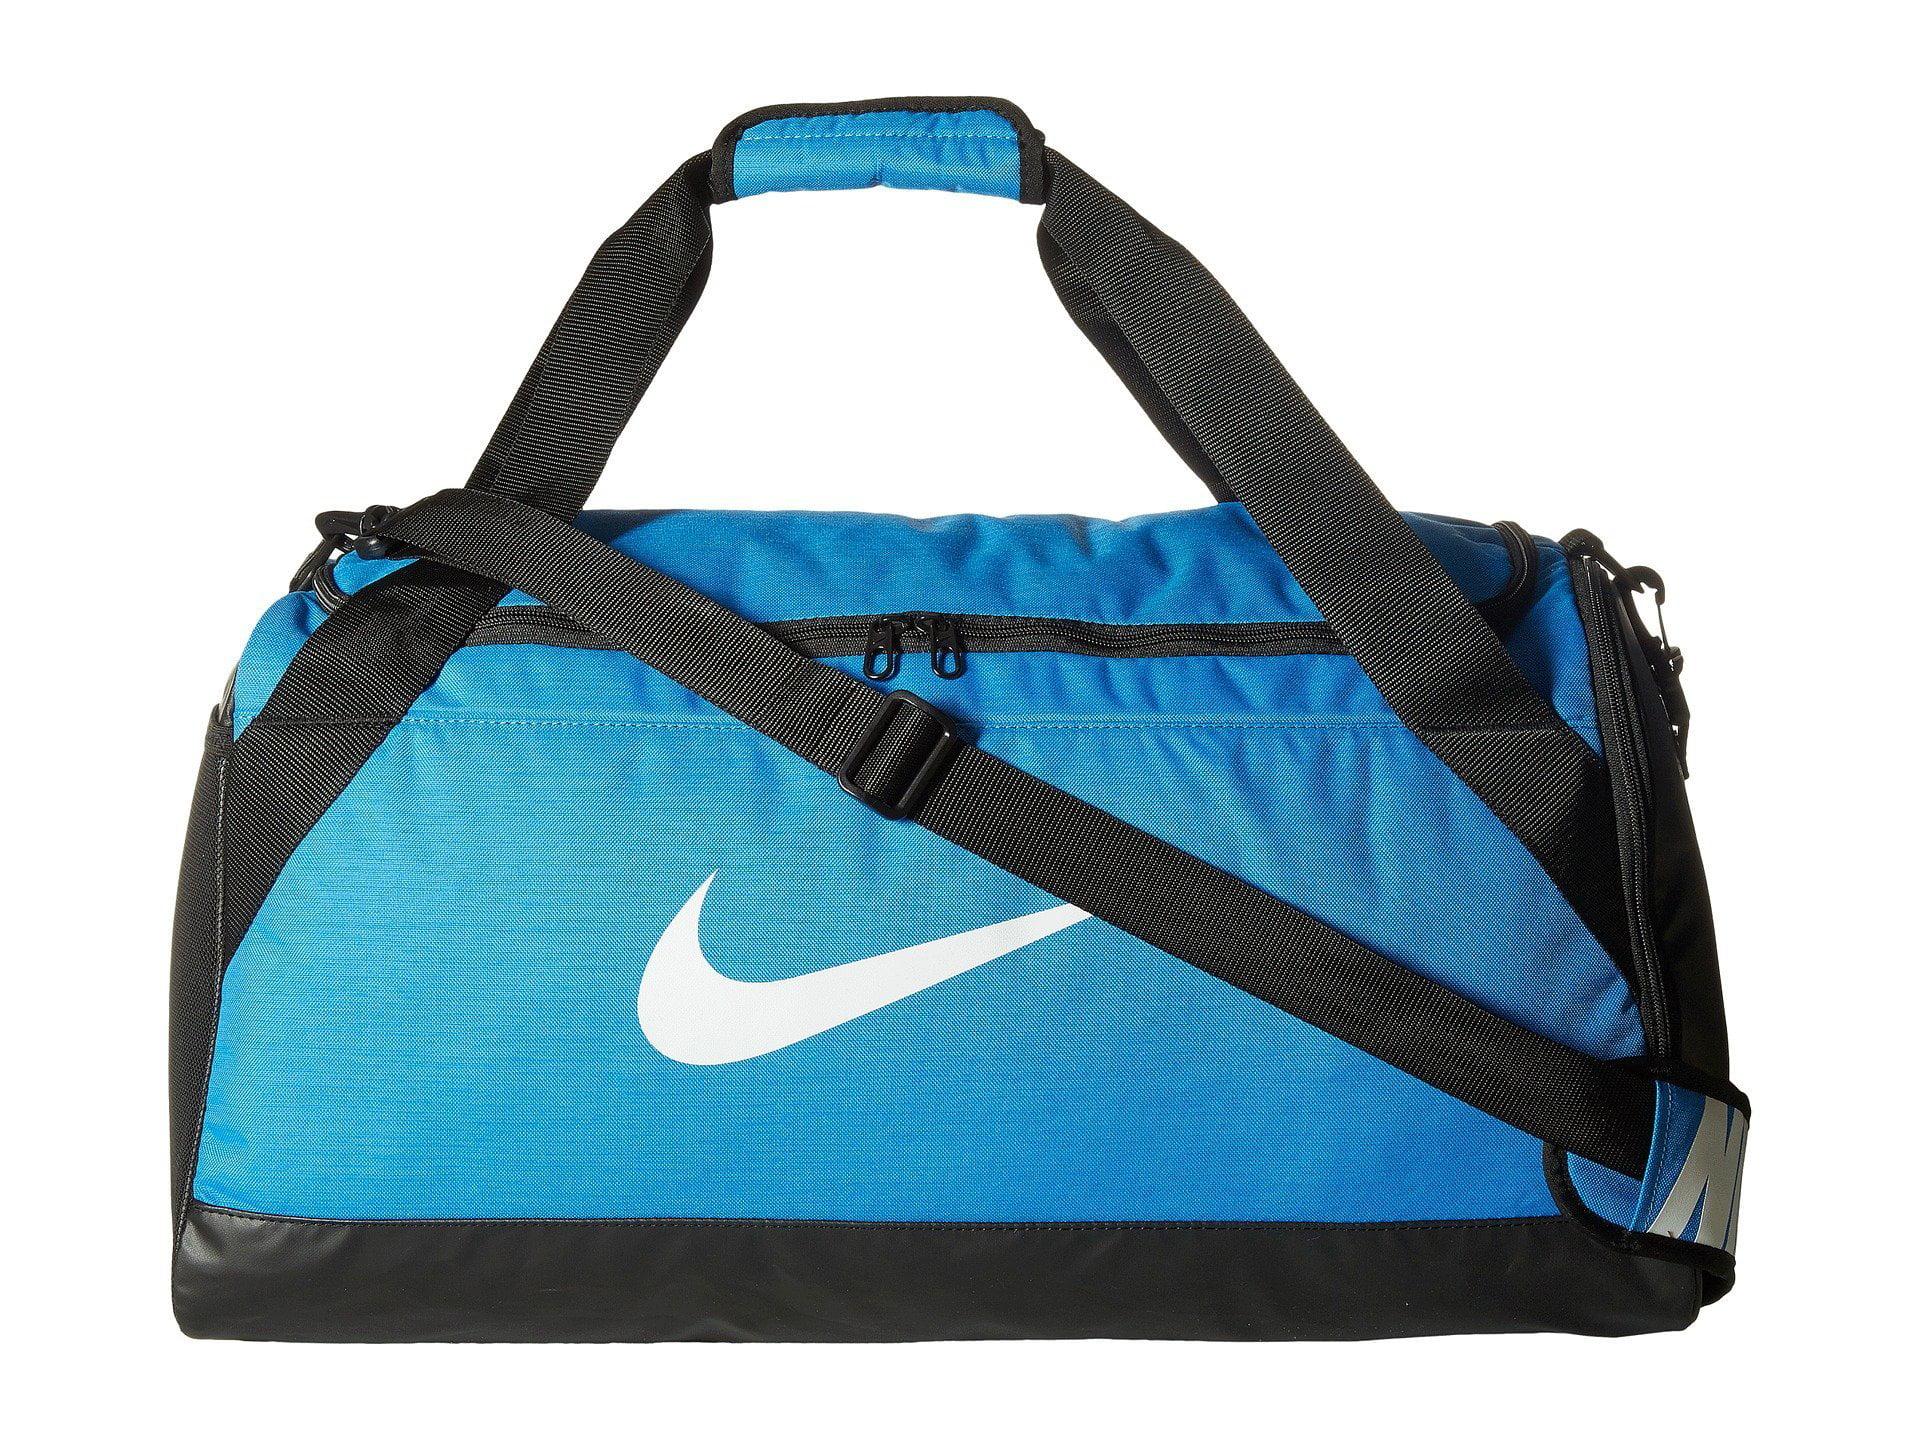 12cd96ddfac2 Nike Brasilia 7 X-Small Duffel Bag Light Photo Blue nkBA5432 435 -  Walmart.com